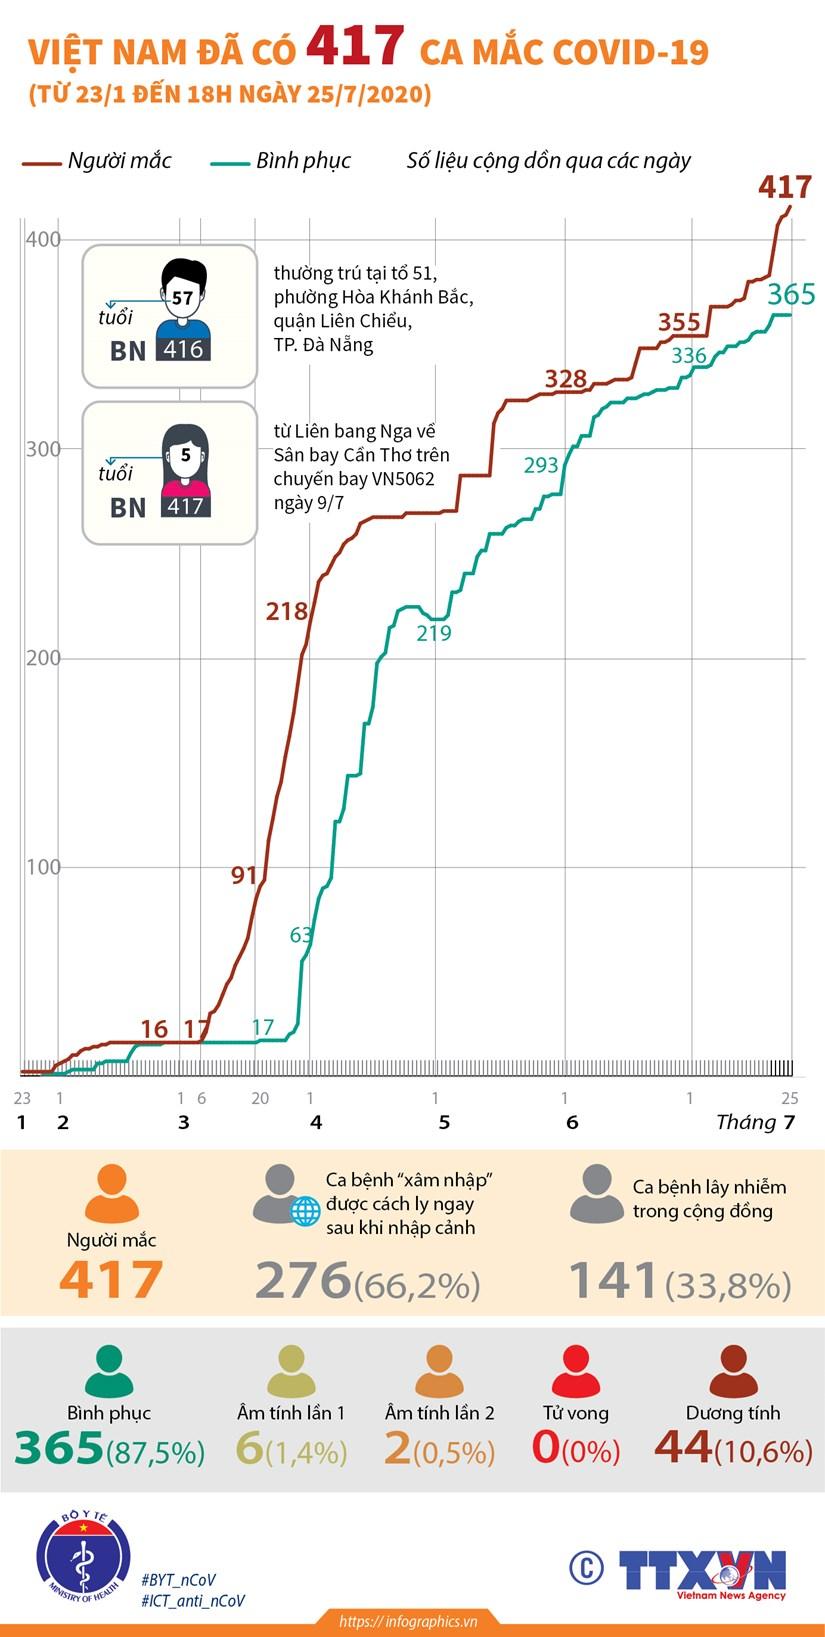 [Infographics] Viet Nam da ghi nhan 417 ca mac COVID-19 hinh anh 1